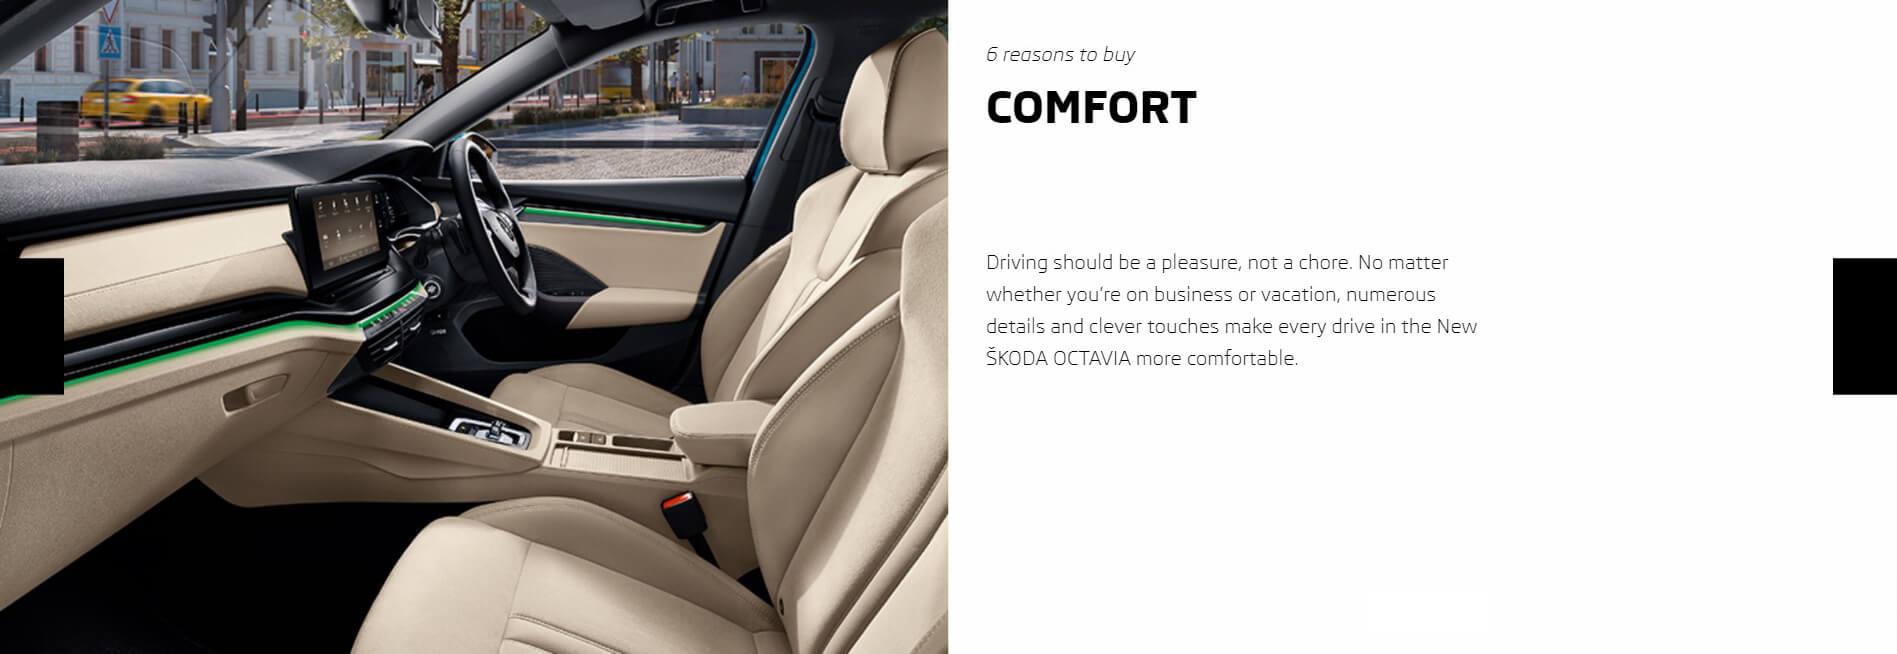 6 Reasons To Buy Octavia 2021 Comfort